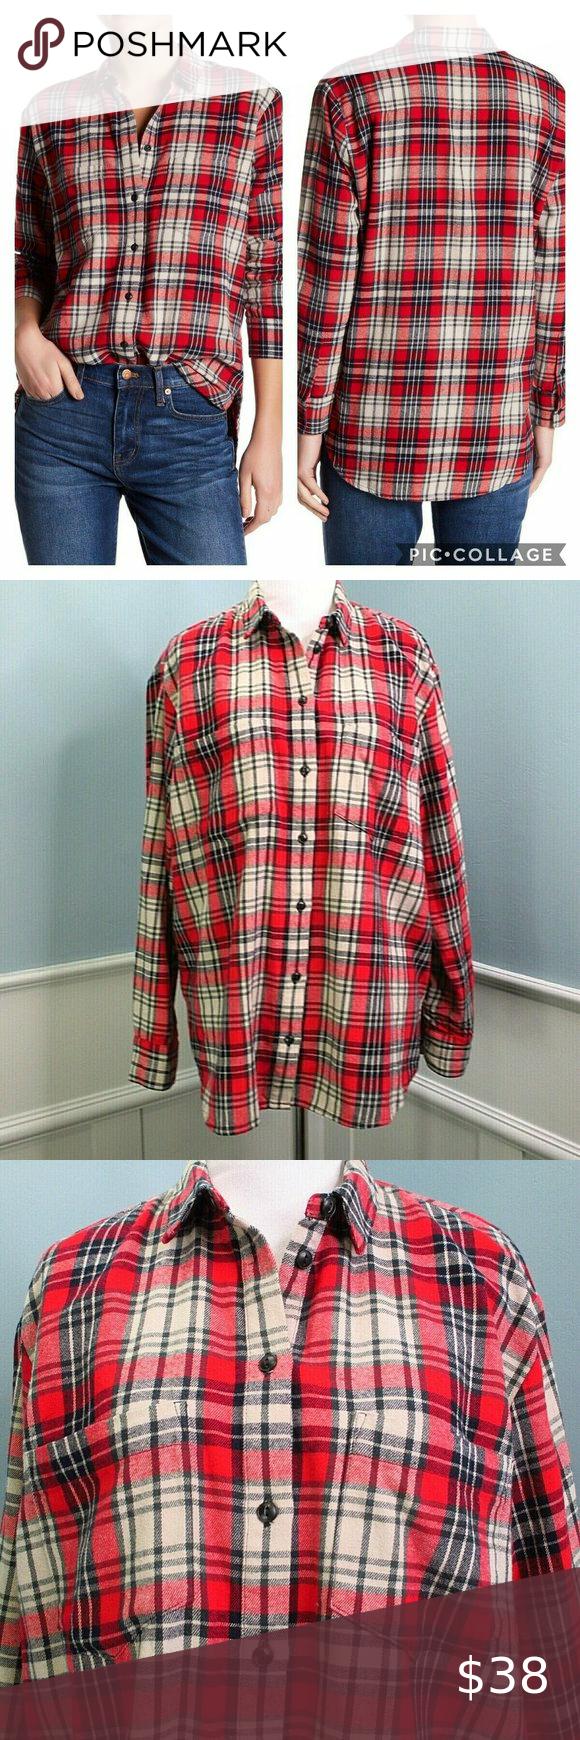 90s Plaid Shirt Womens Large Zip Up Shirt Oversize Tartan Blouse Brown Black Short Sleeve Top Checked Print Zippered Over Shirt Size L